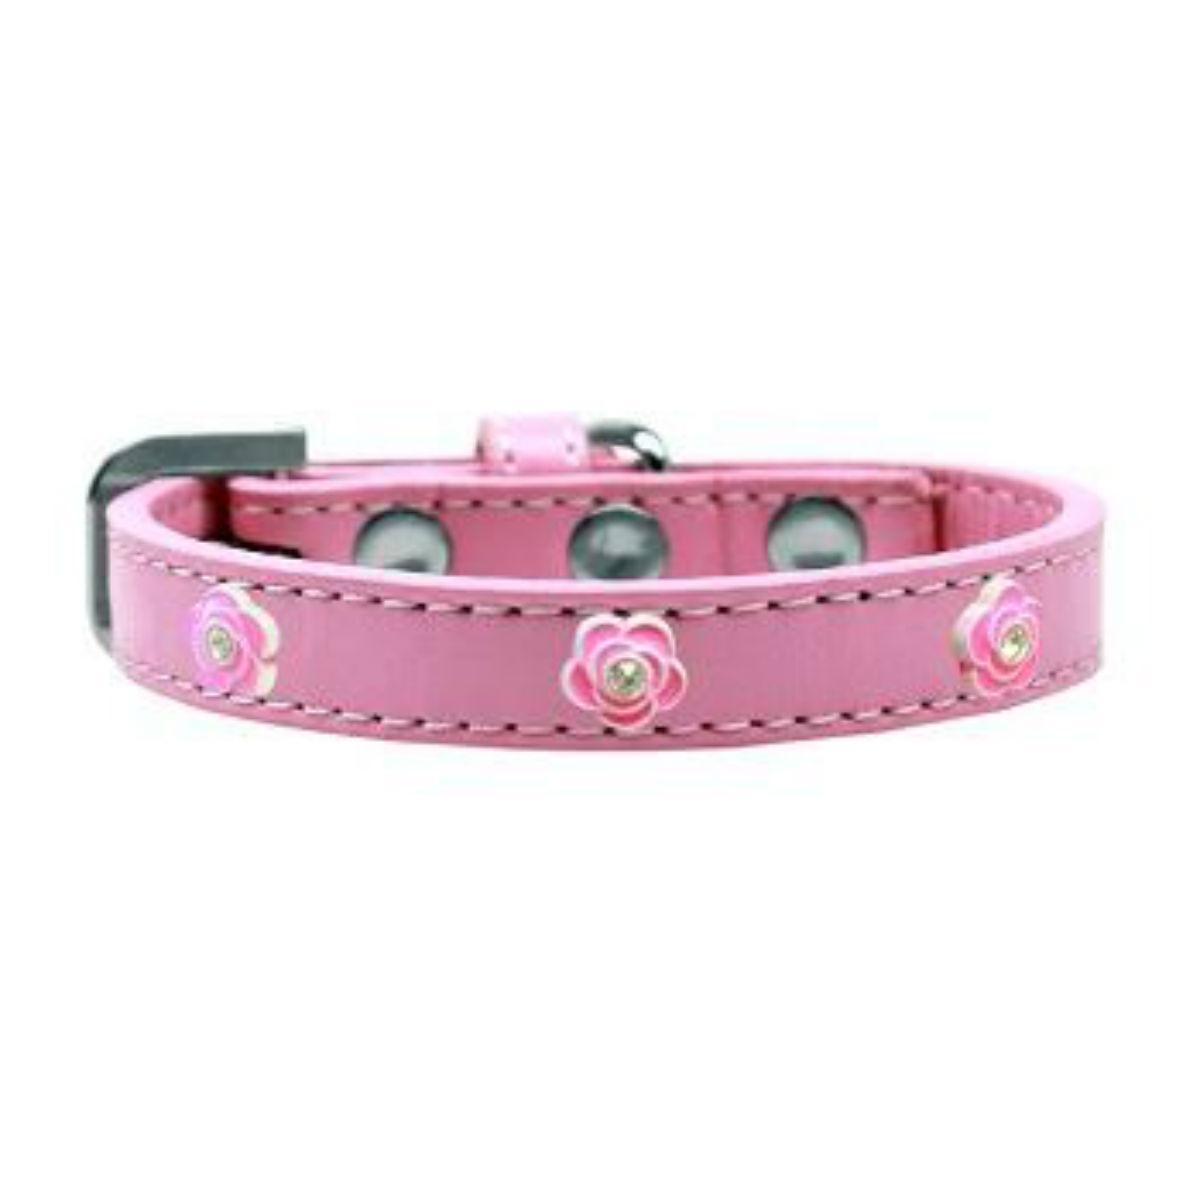 Bright Pink Rose Widget Dog Collar - Light Pink